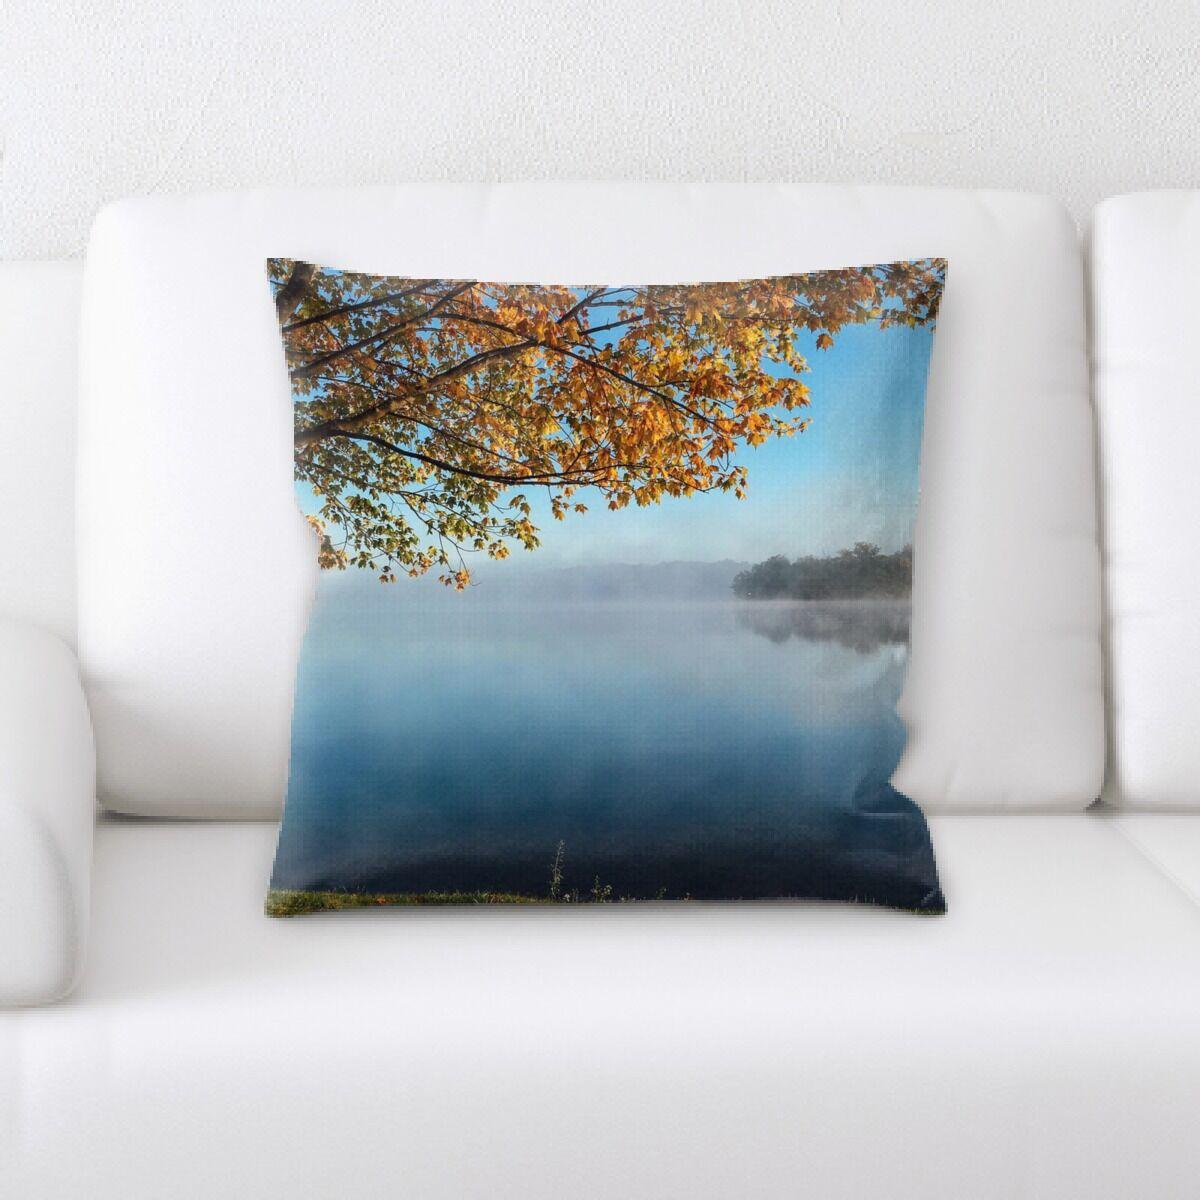 Yukon Meditation and Calming Moments (2) Throw Pillow